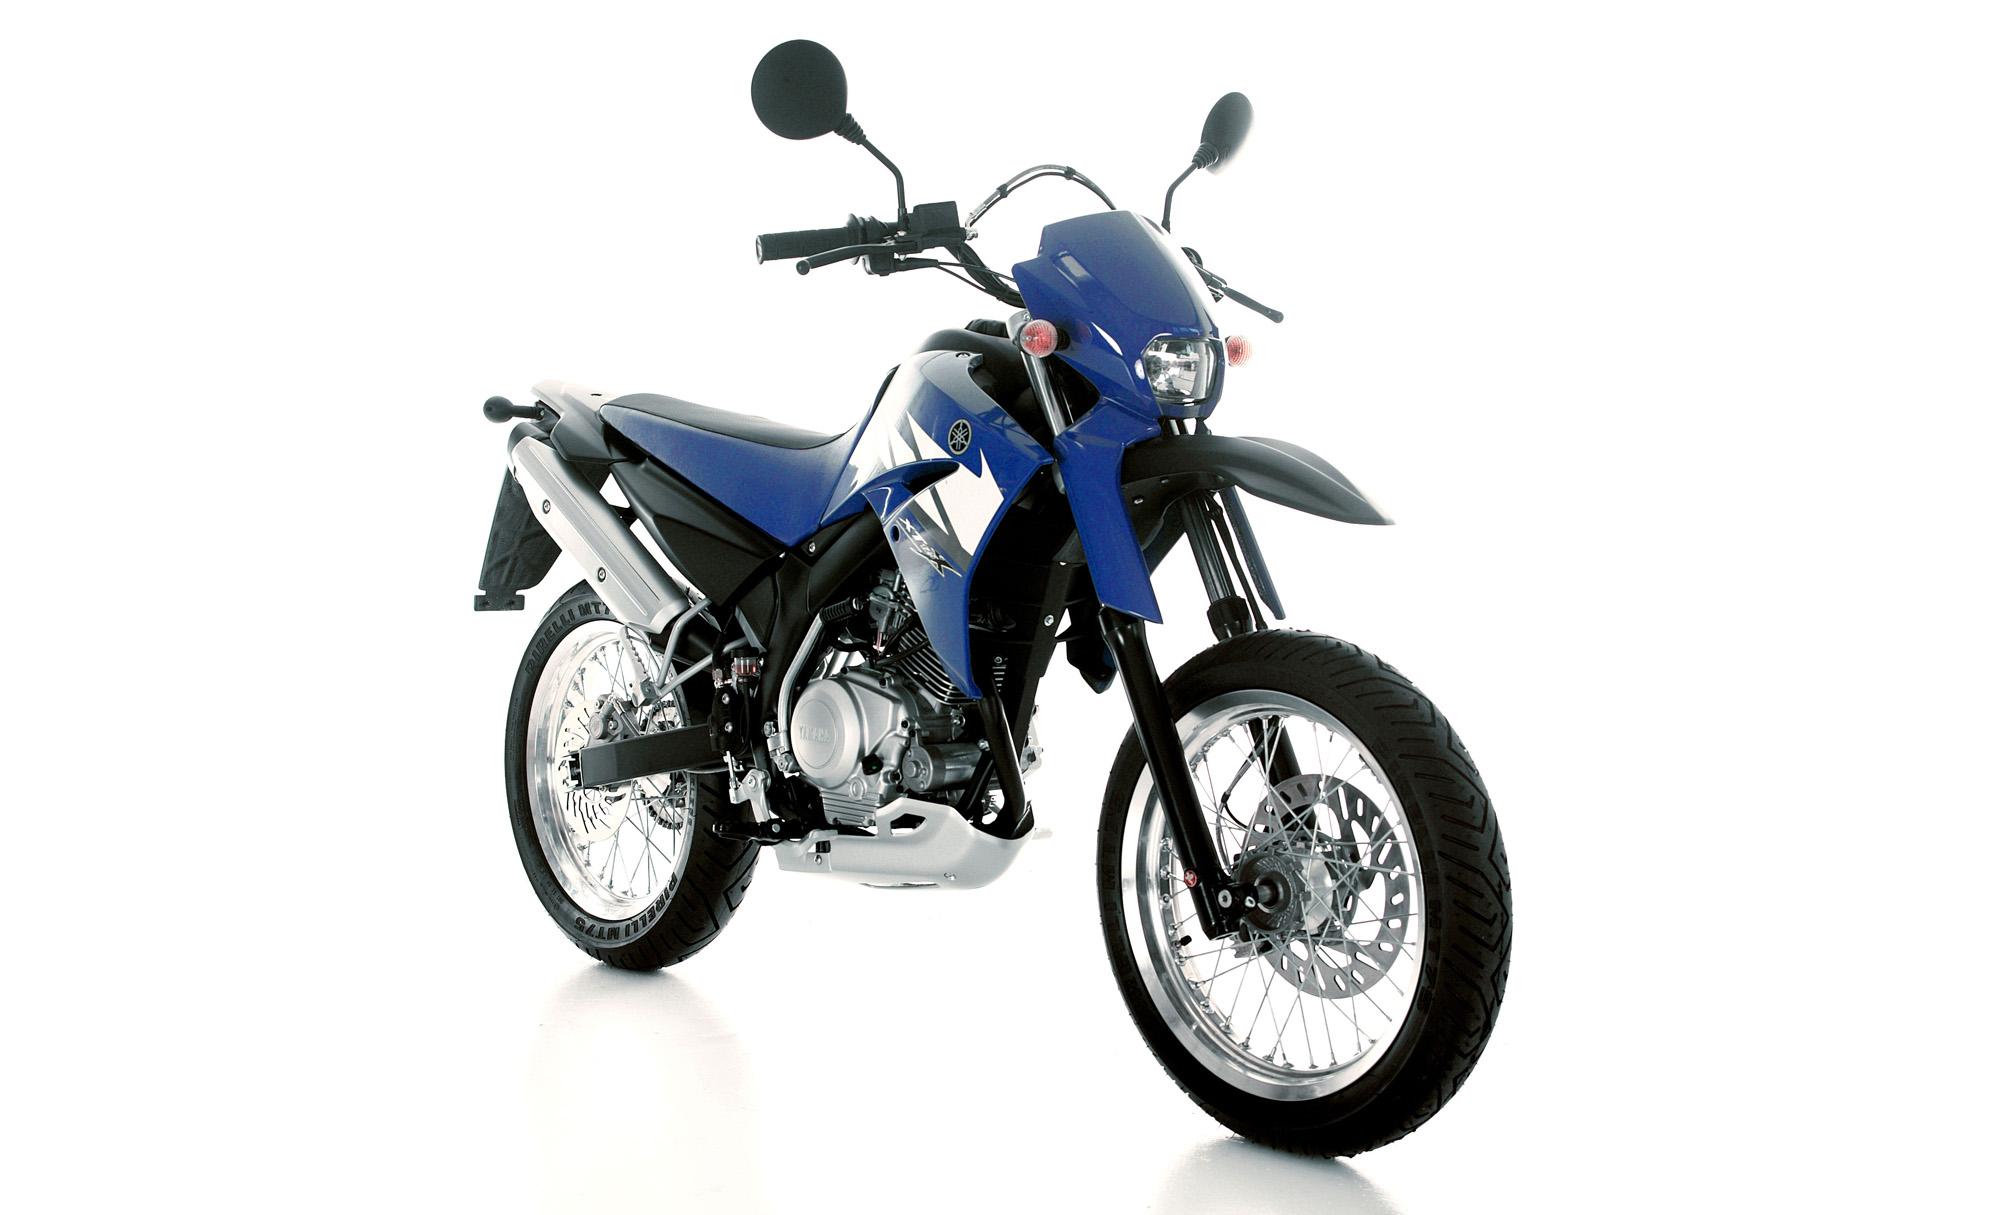 Moto Yamaha Xt 125 Idea Di Immagine Del Motocicletta